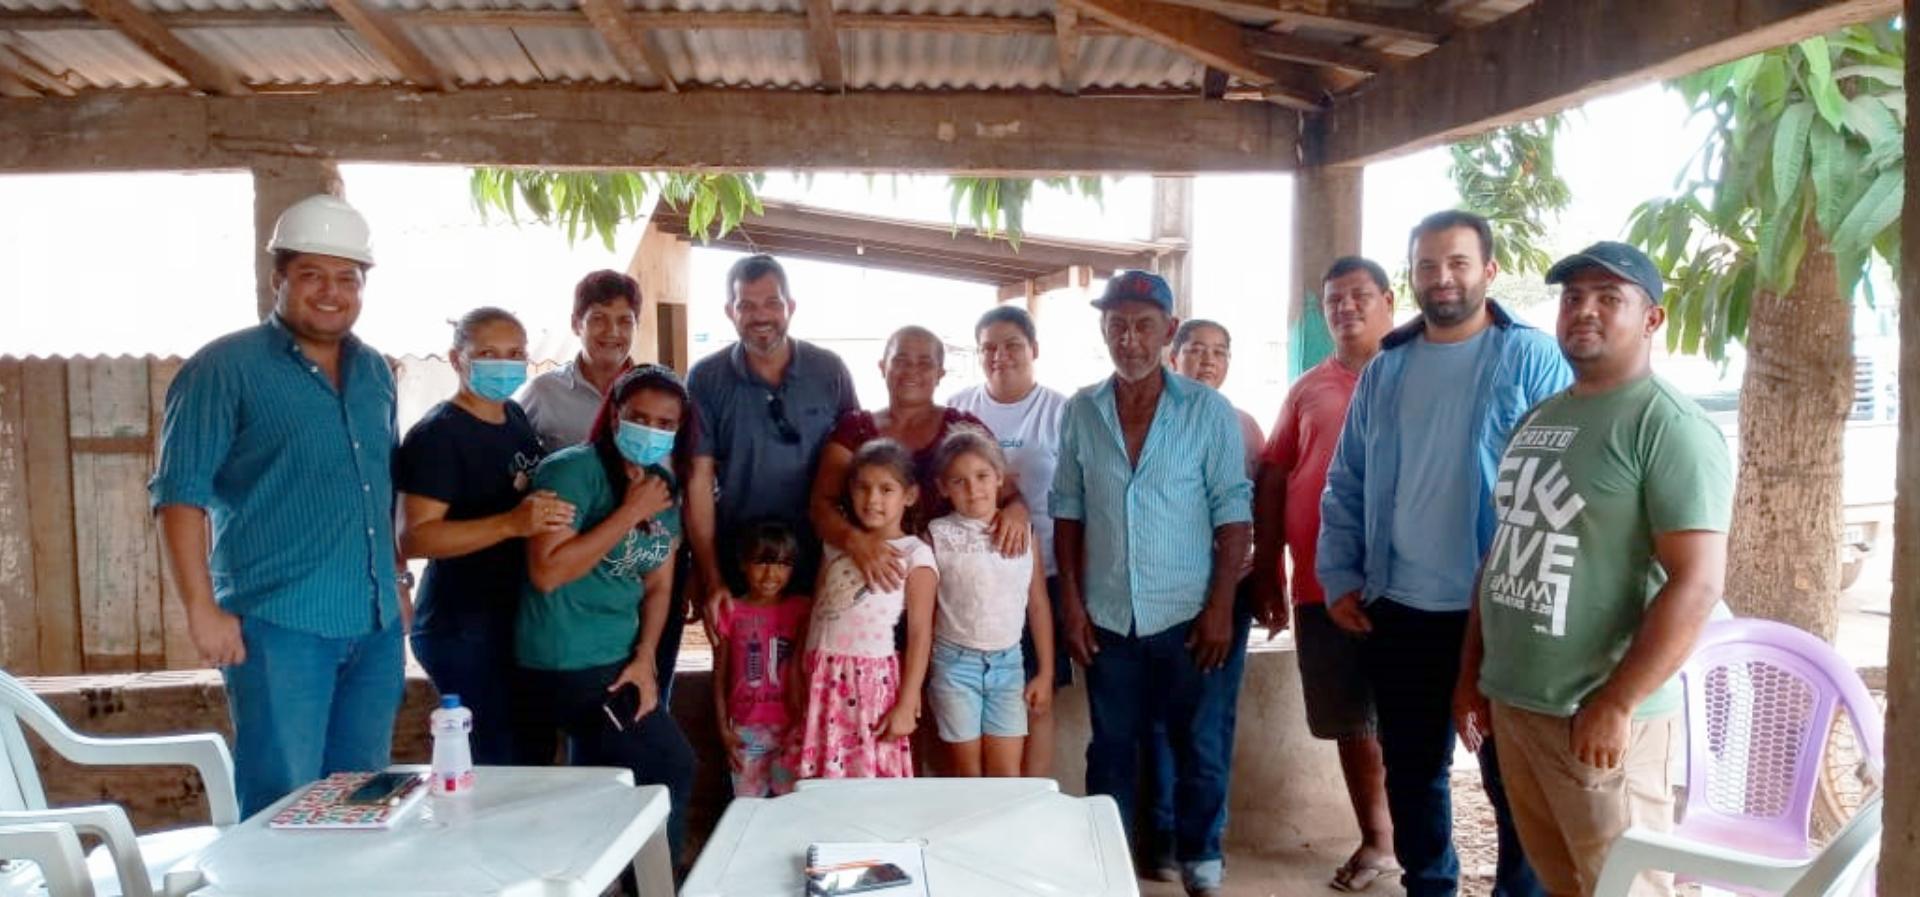 Equipe RMB e a comunidade da vila do Alto Bonito